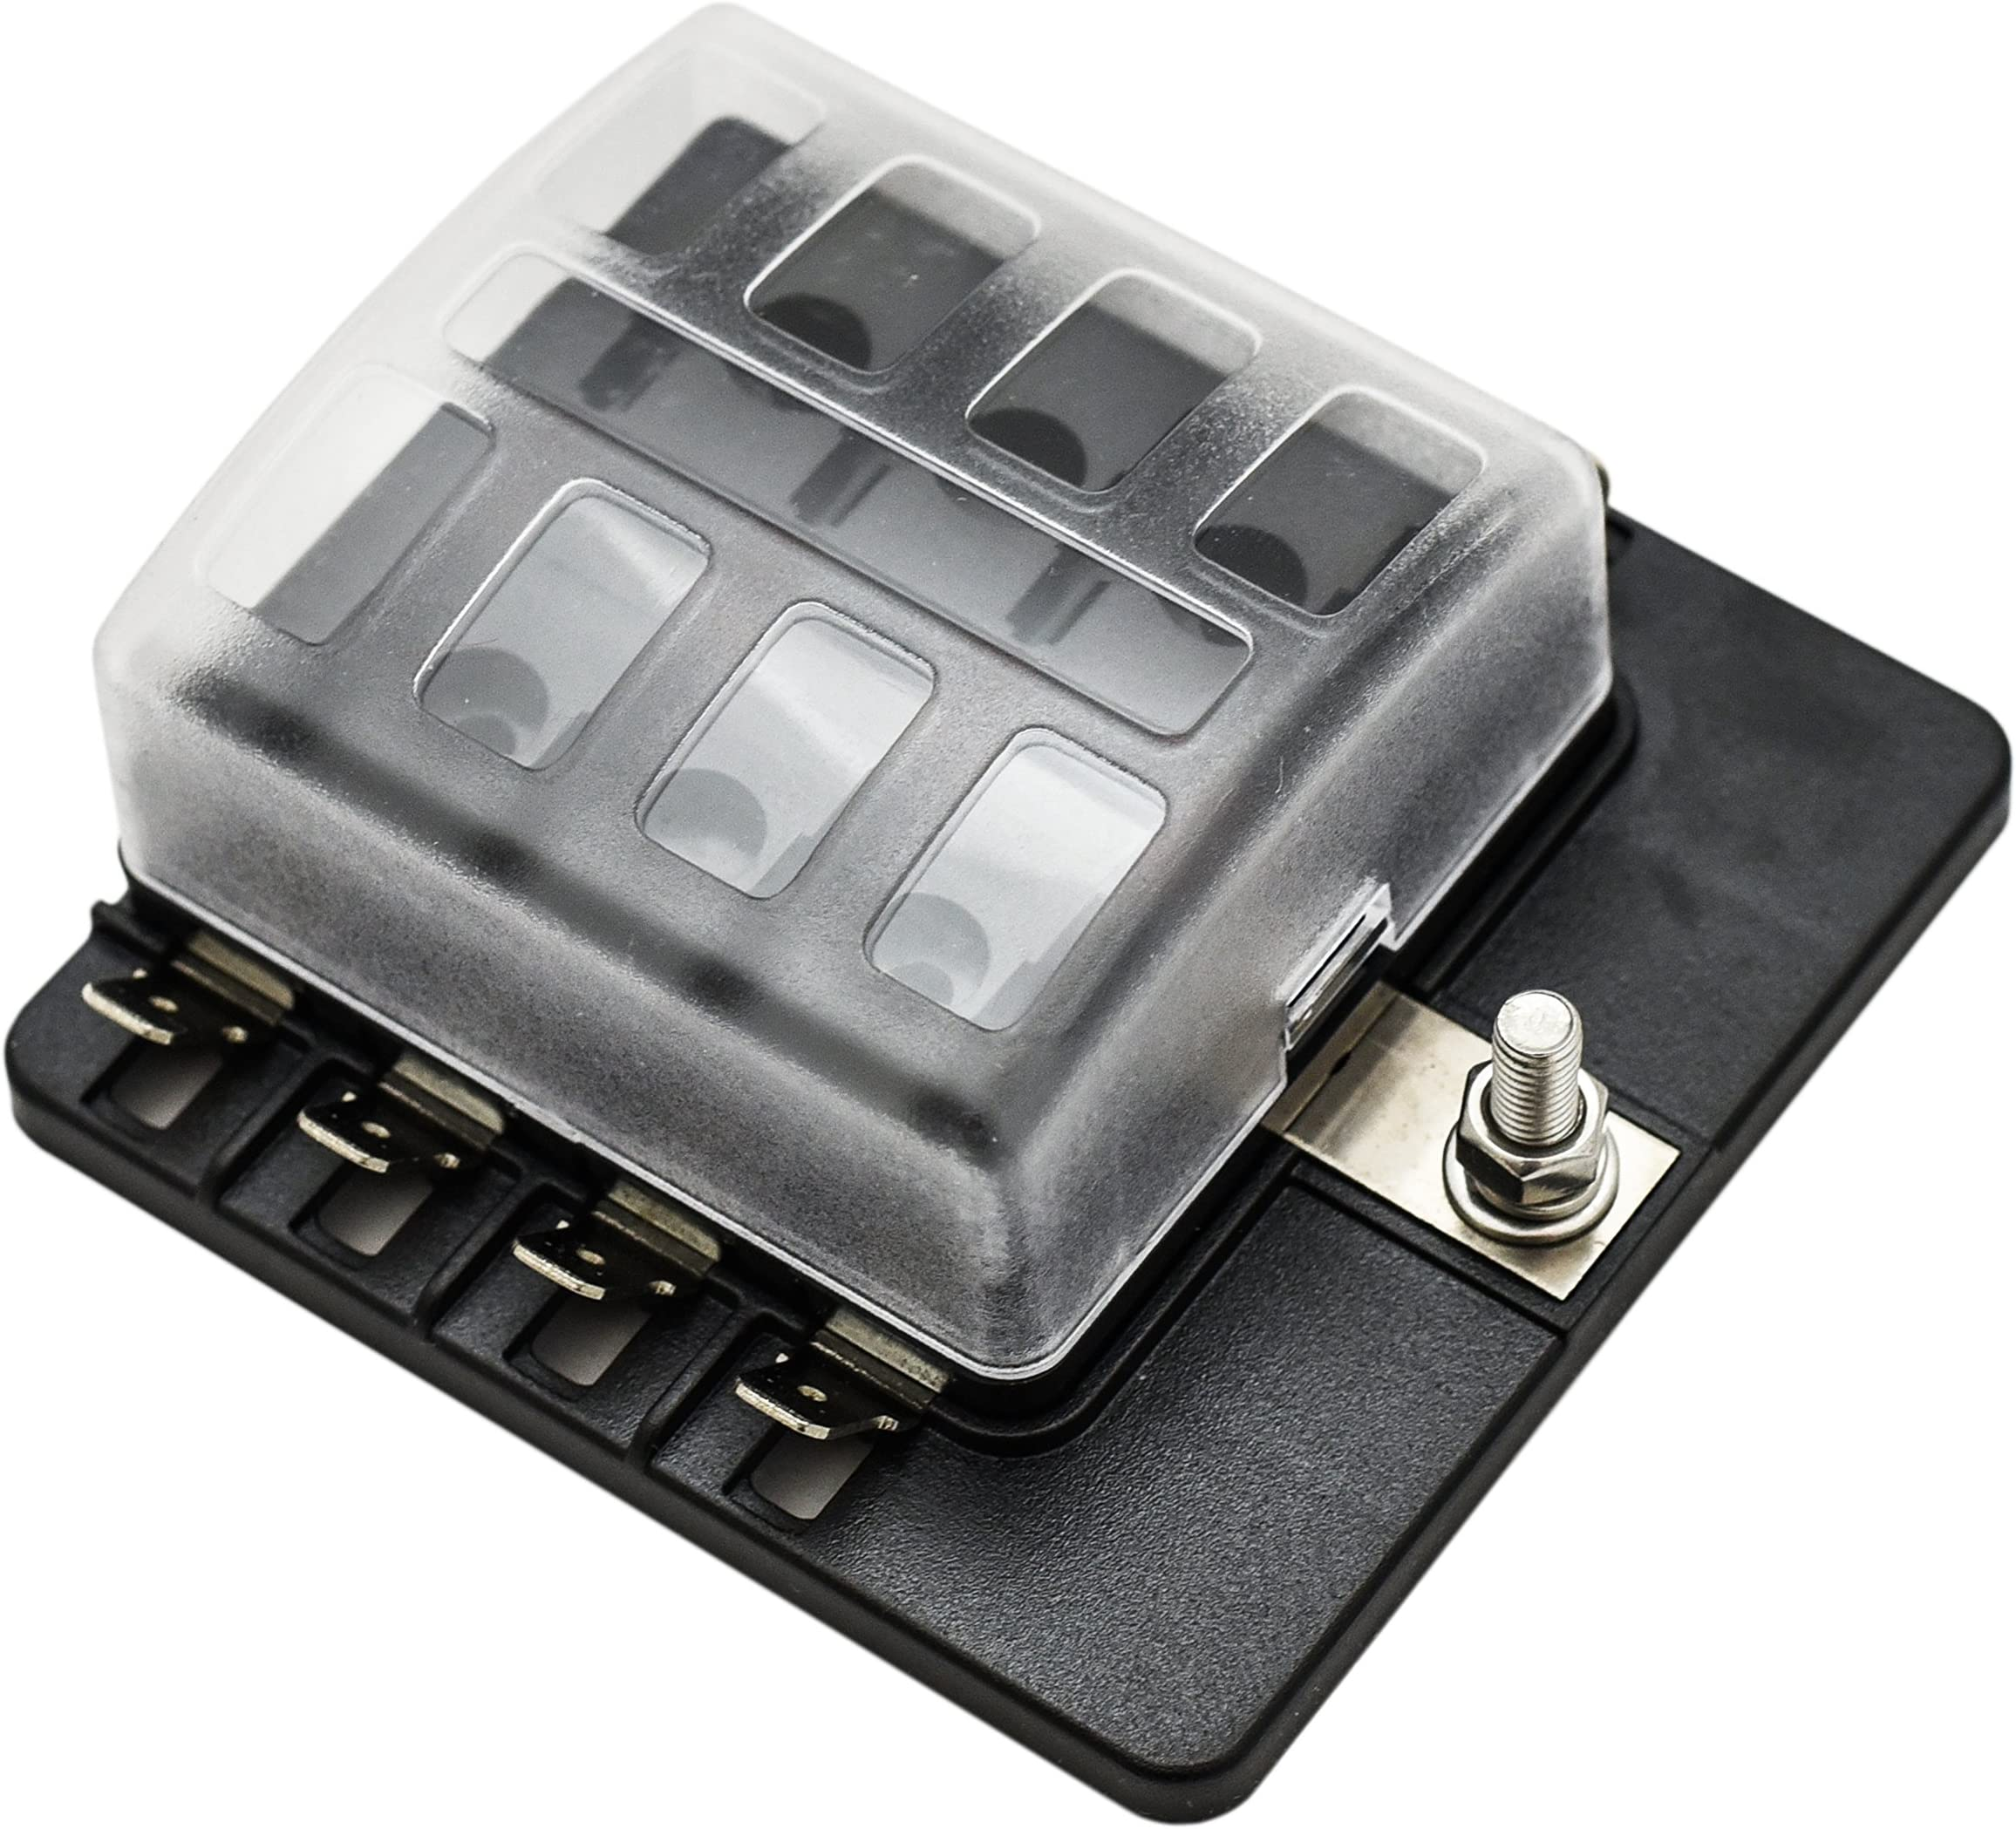 Amazon Com Fuse Boxes Fuses & Accessories Automotive Universal Fuse Block With Relays Fuse Block Autozone Automotive Fuse Box Replacement